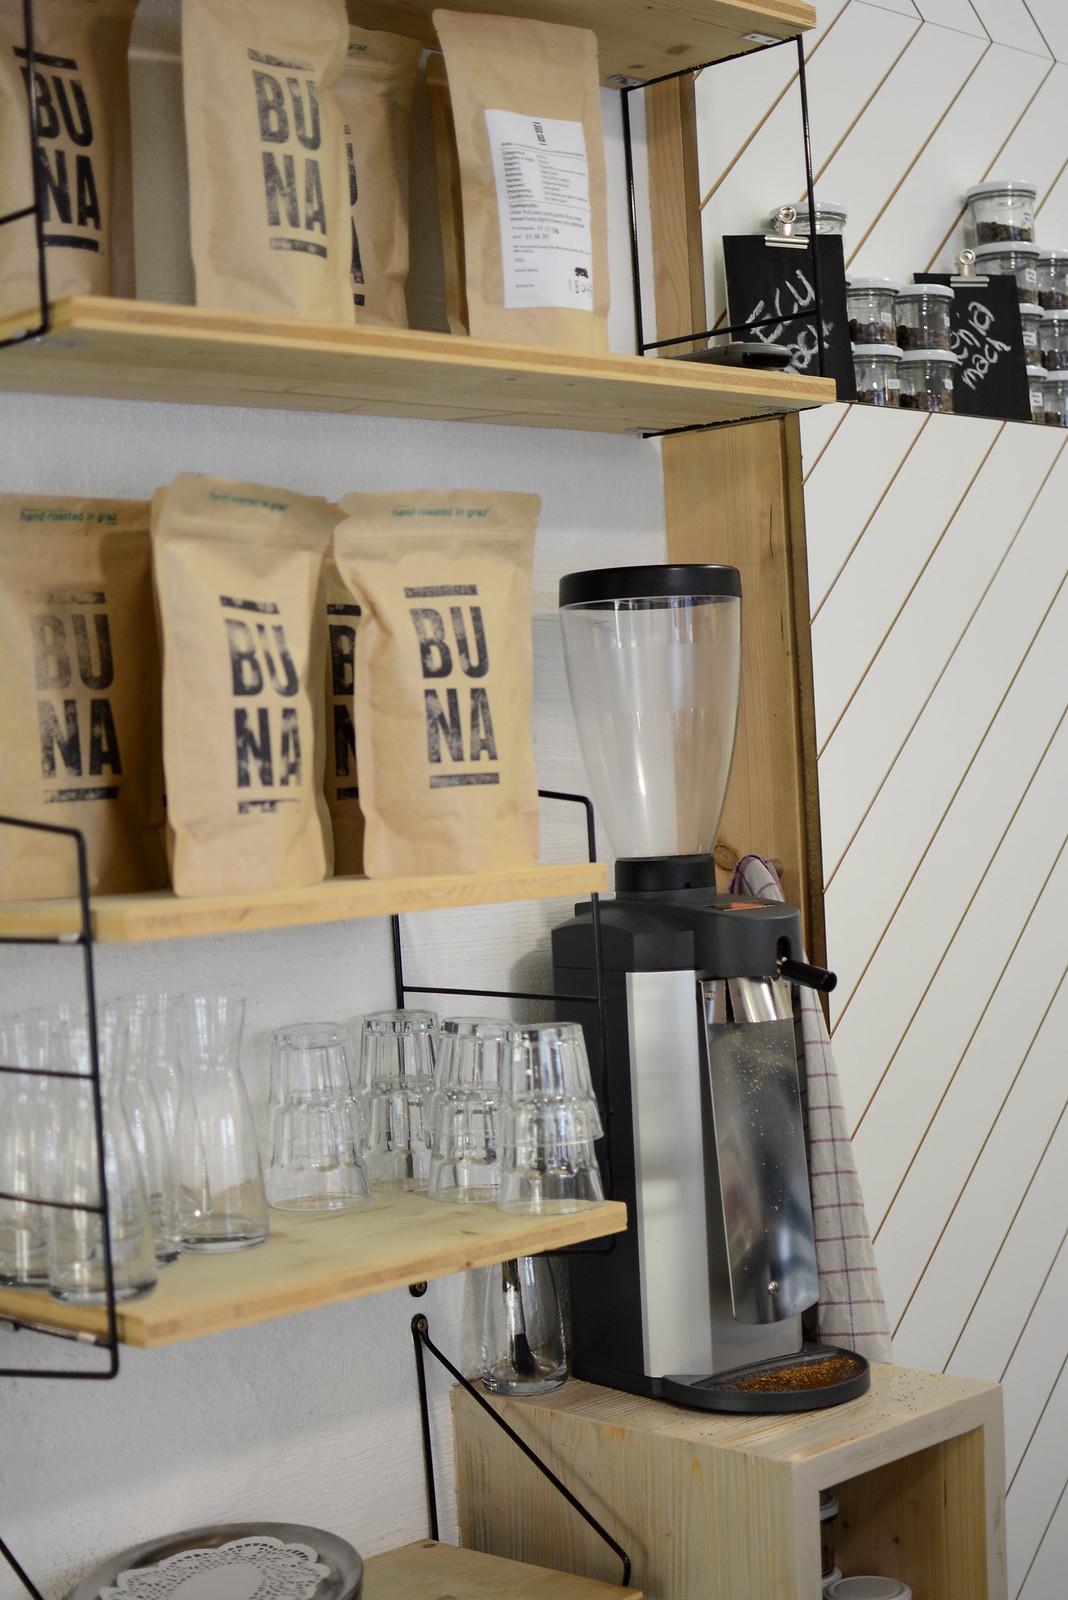 Coffee-Graz_Buna-Kaffeeladen-Kaffee